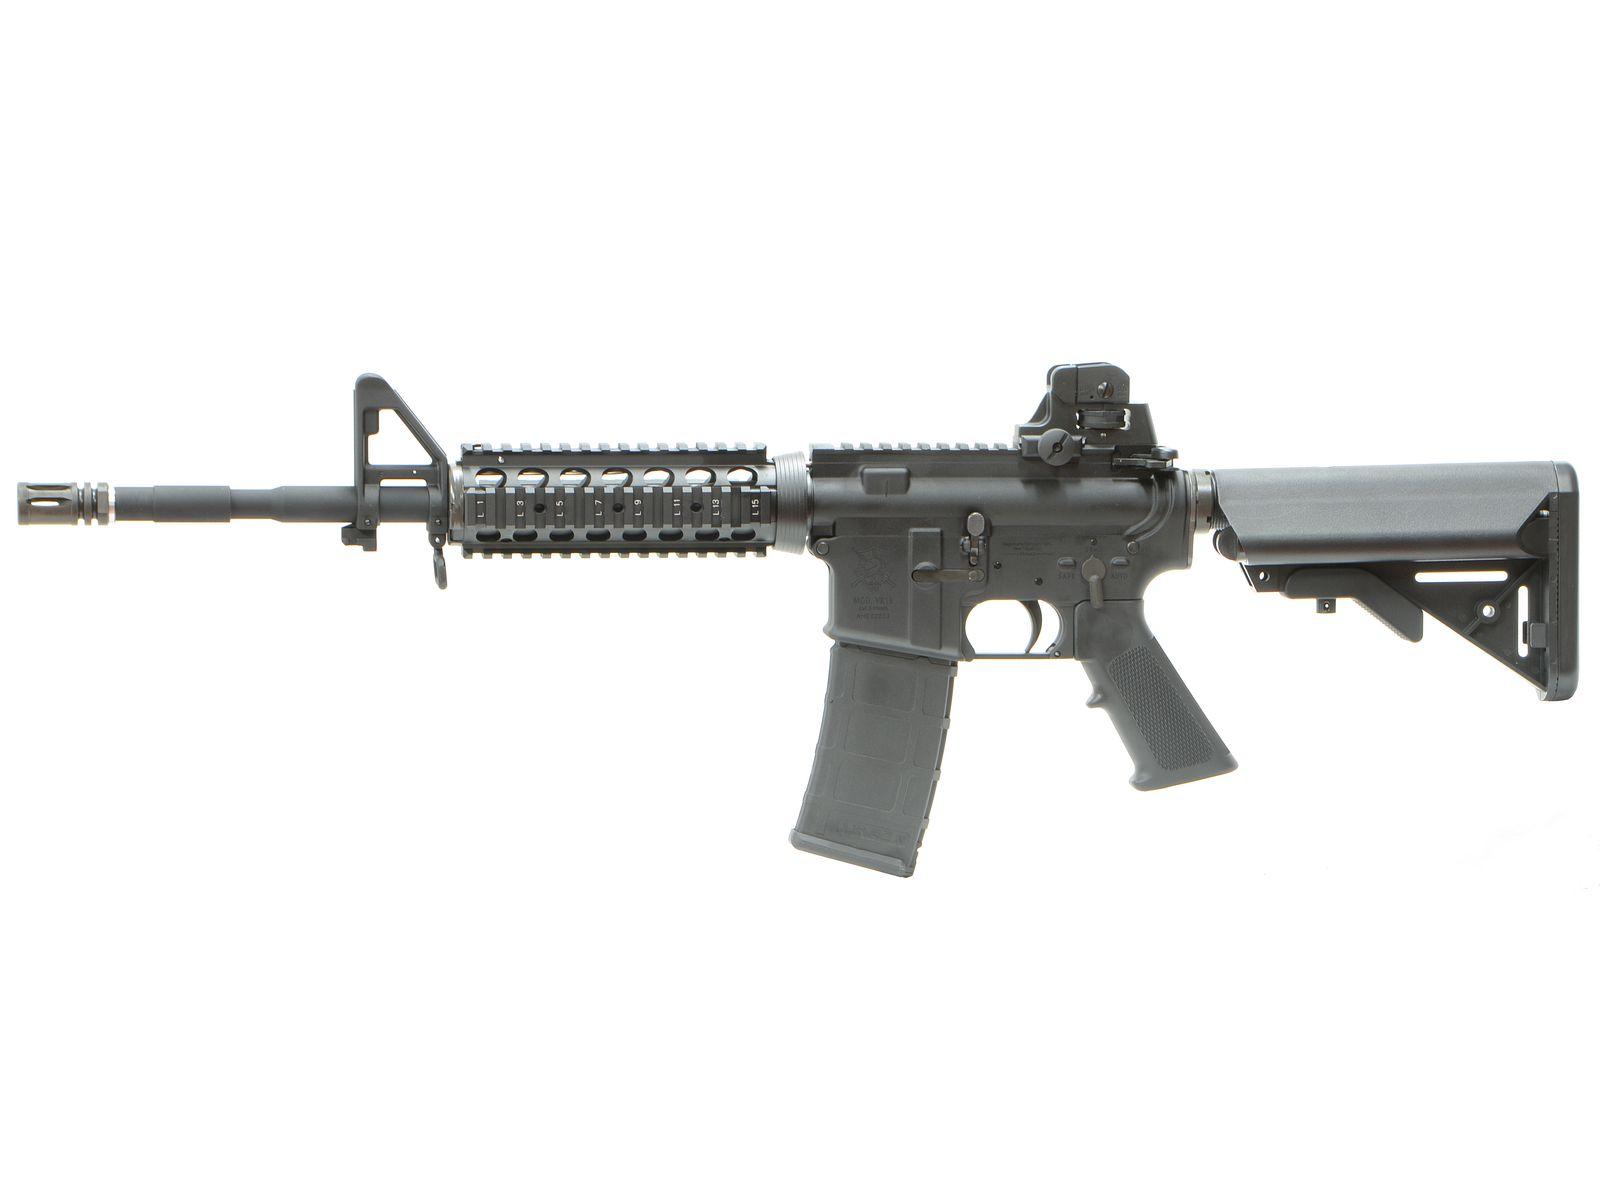 VFC VR16 RIS M145 GBBR